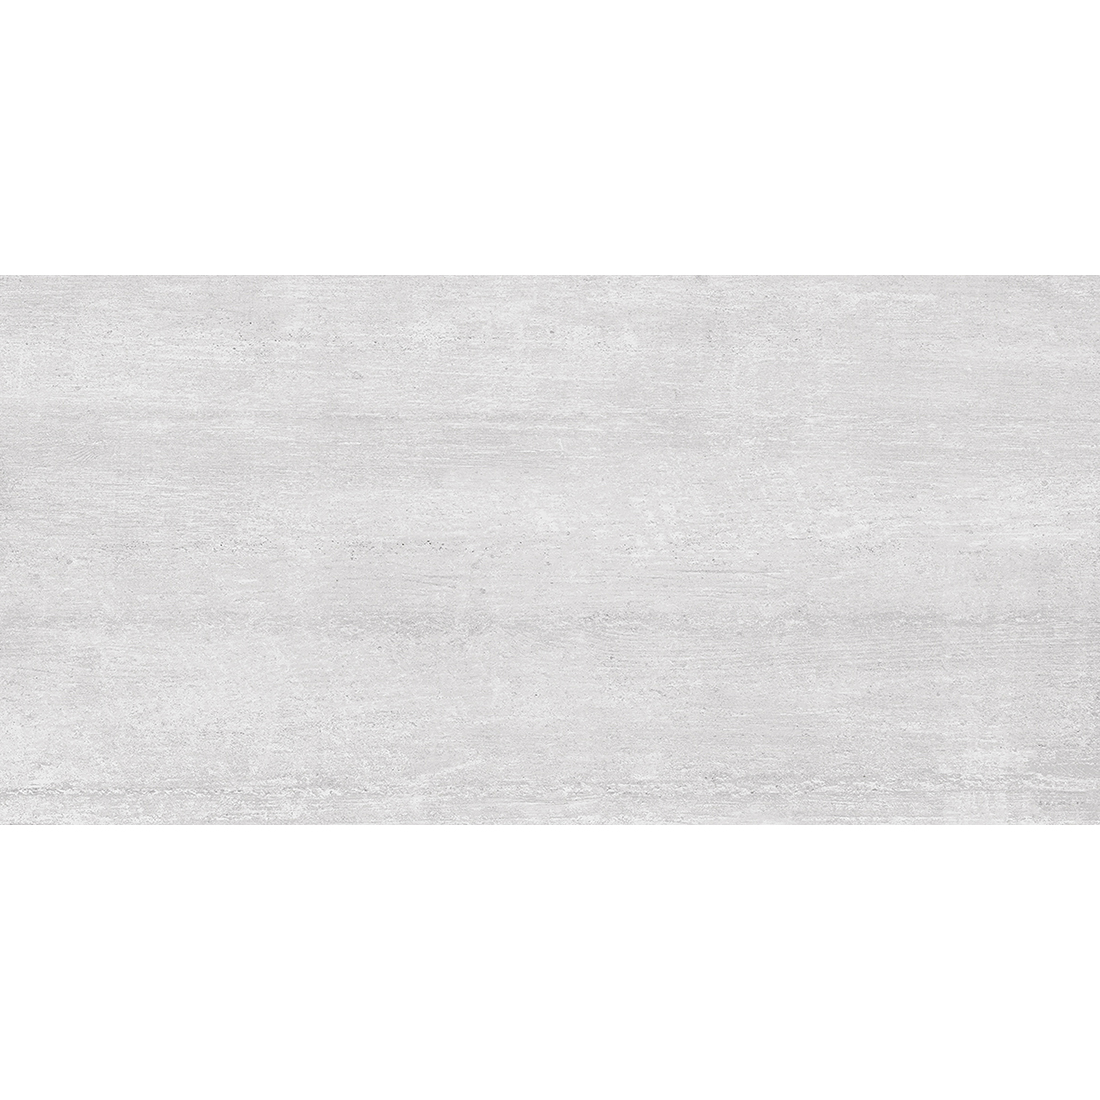 Cemento Rustico 30x60 Light Grey Matt 1